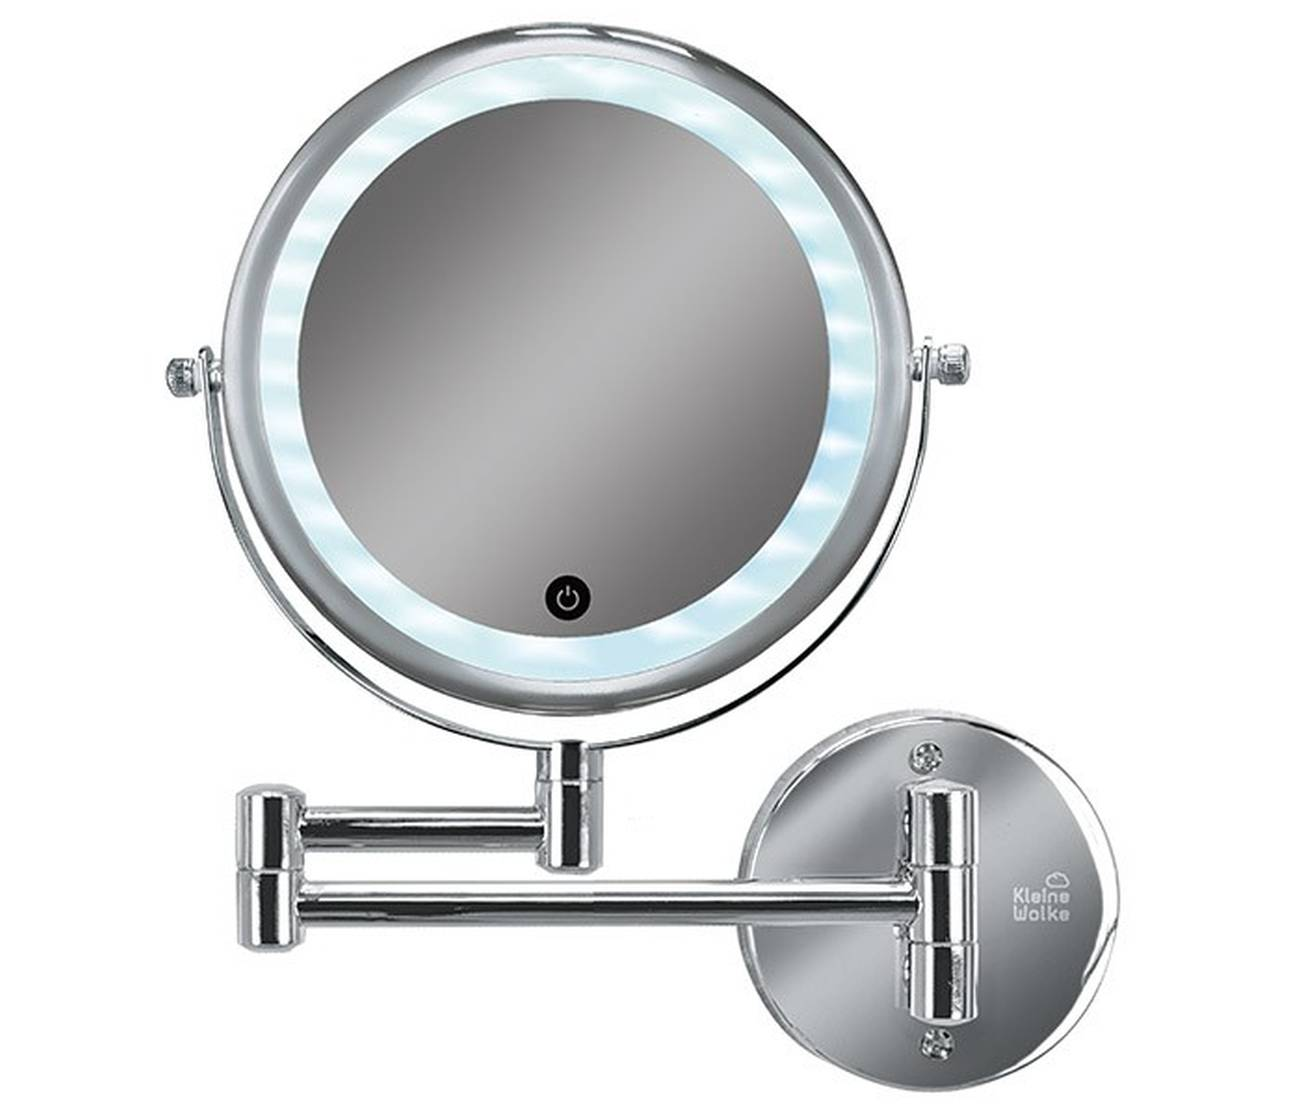 Kosmetikspiegel Lumi Mirror Metall chromiert/Glas/LED Silber Spiegel